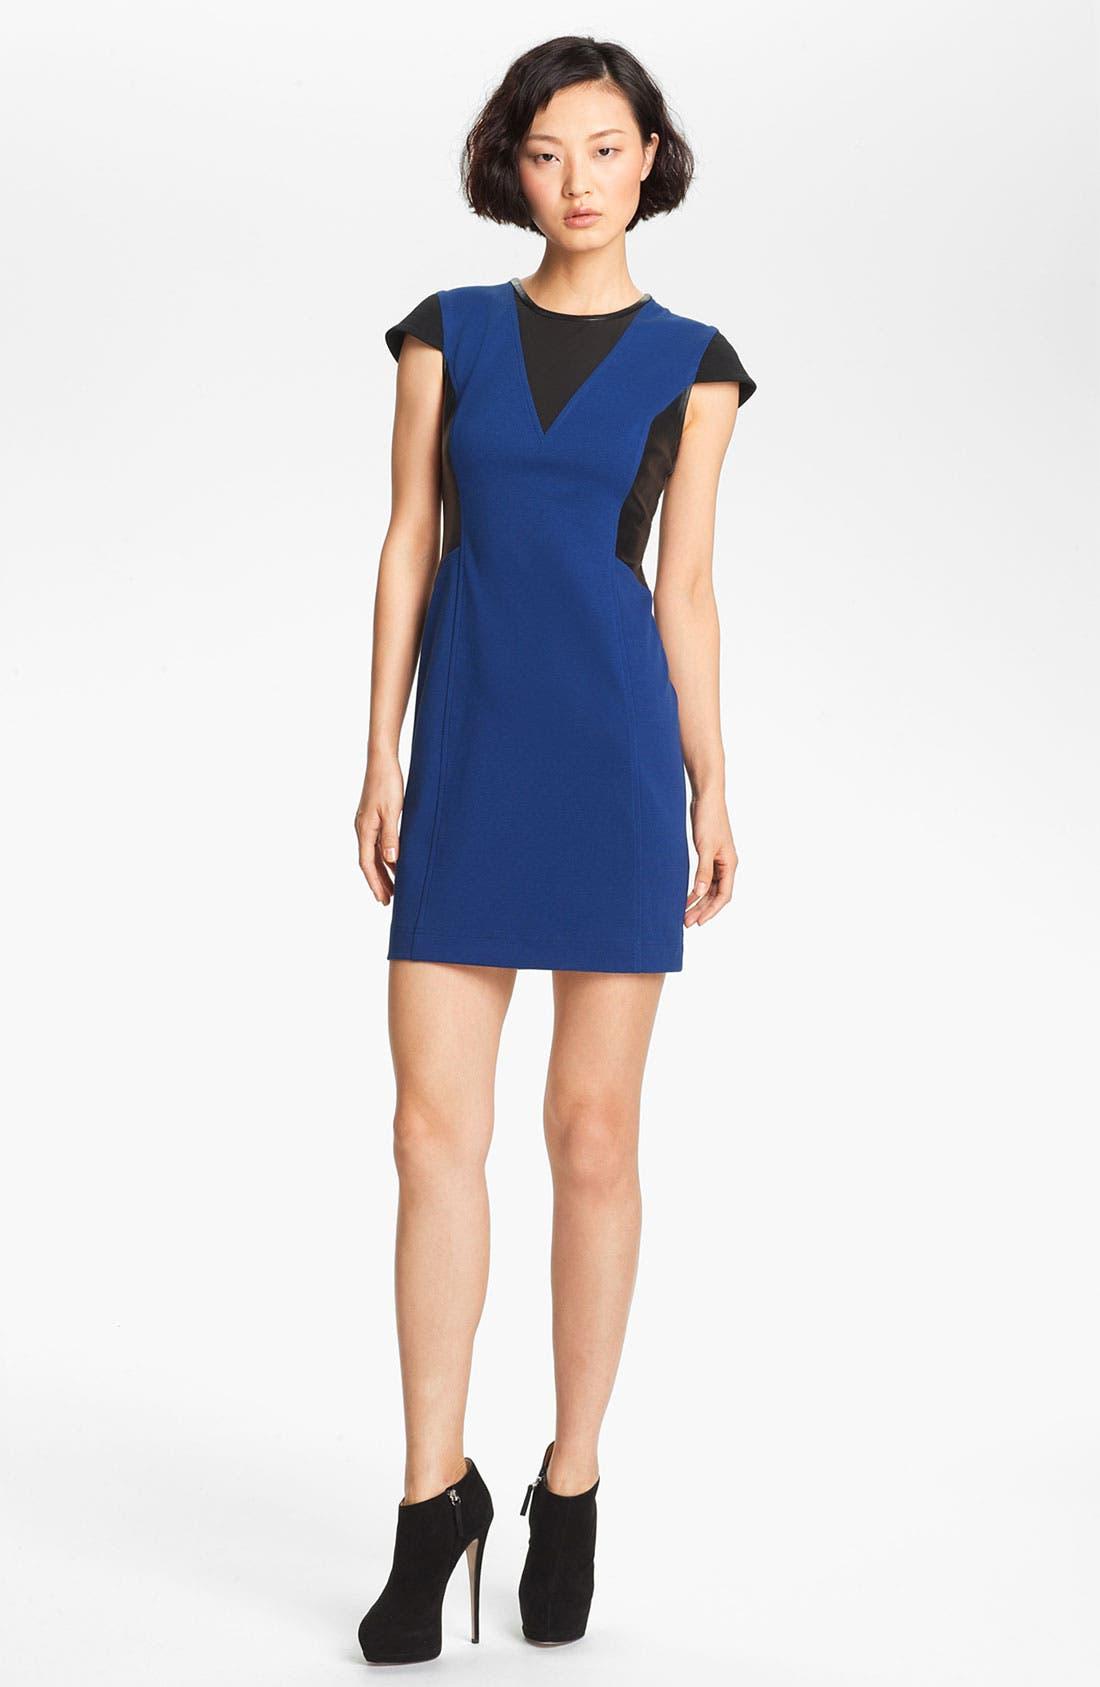 Main Image - Cut25 Leather & Ponte Knit Dress